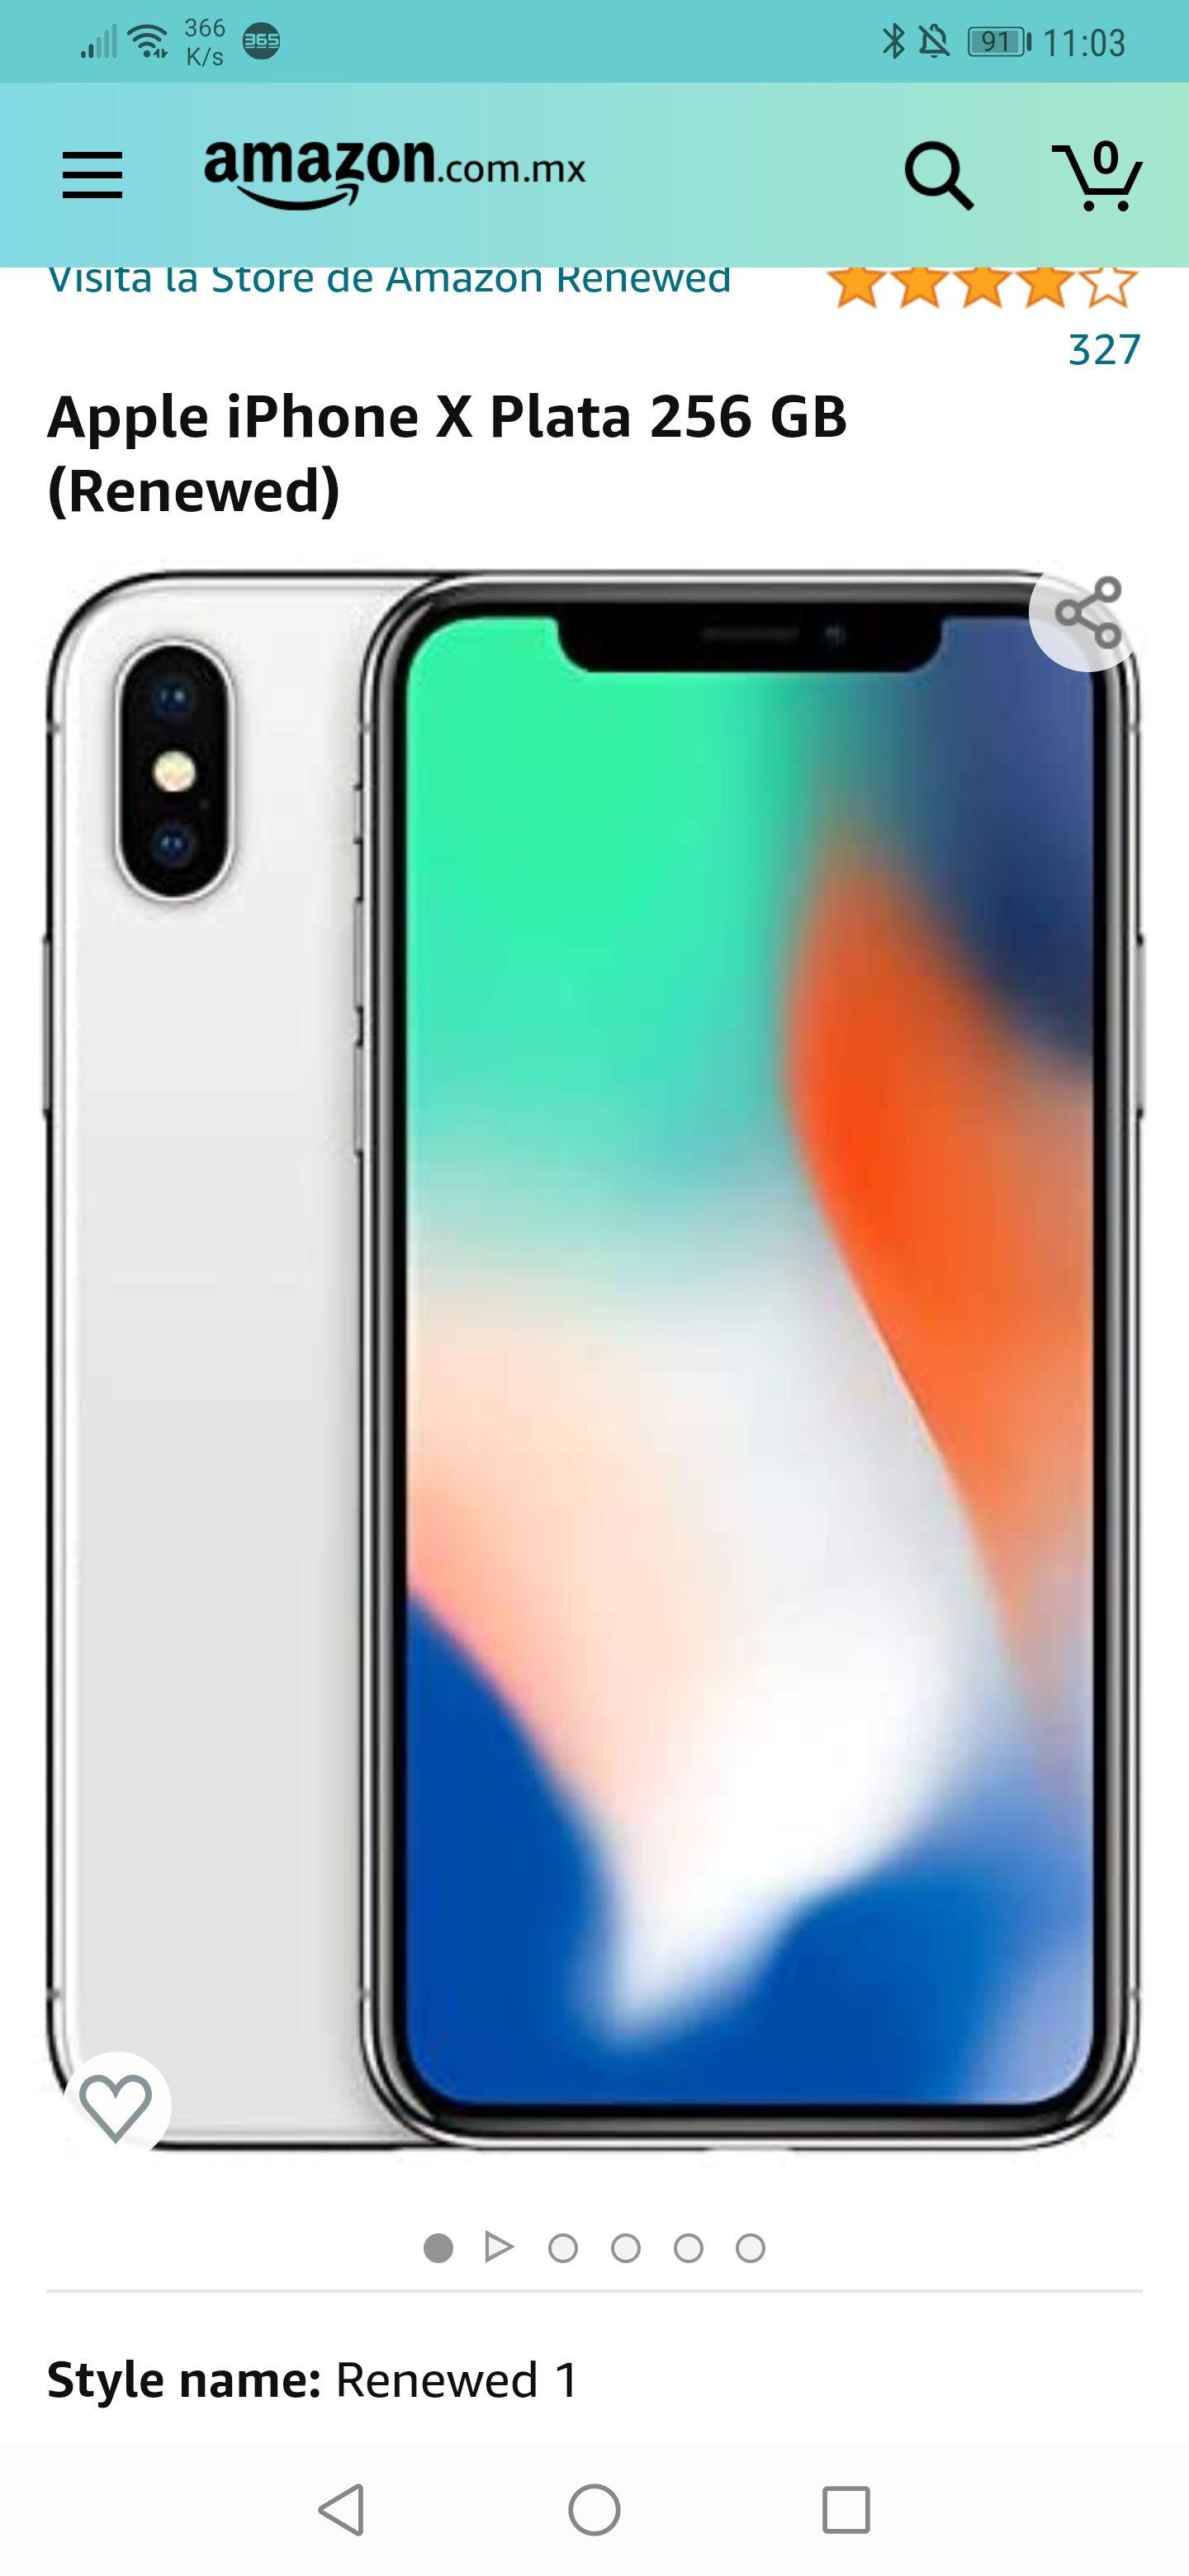 Amazon : Apple iPhone X Plata 256 GB (Renewed)